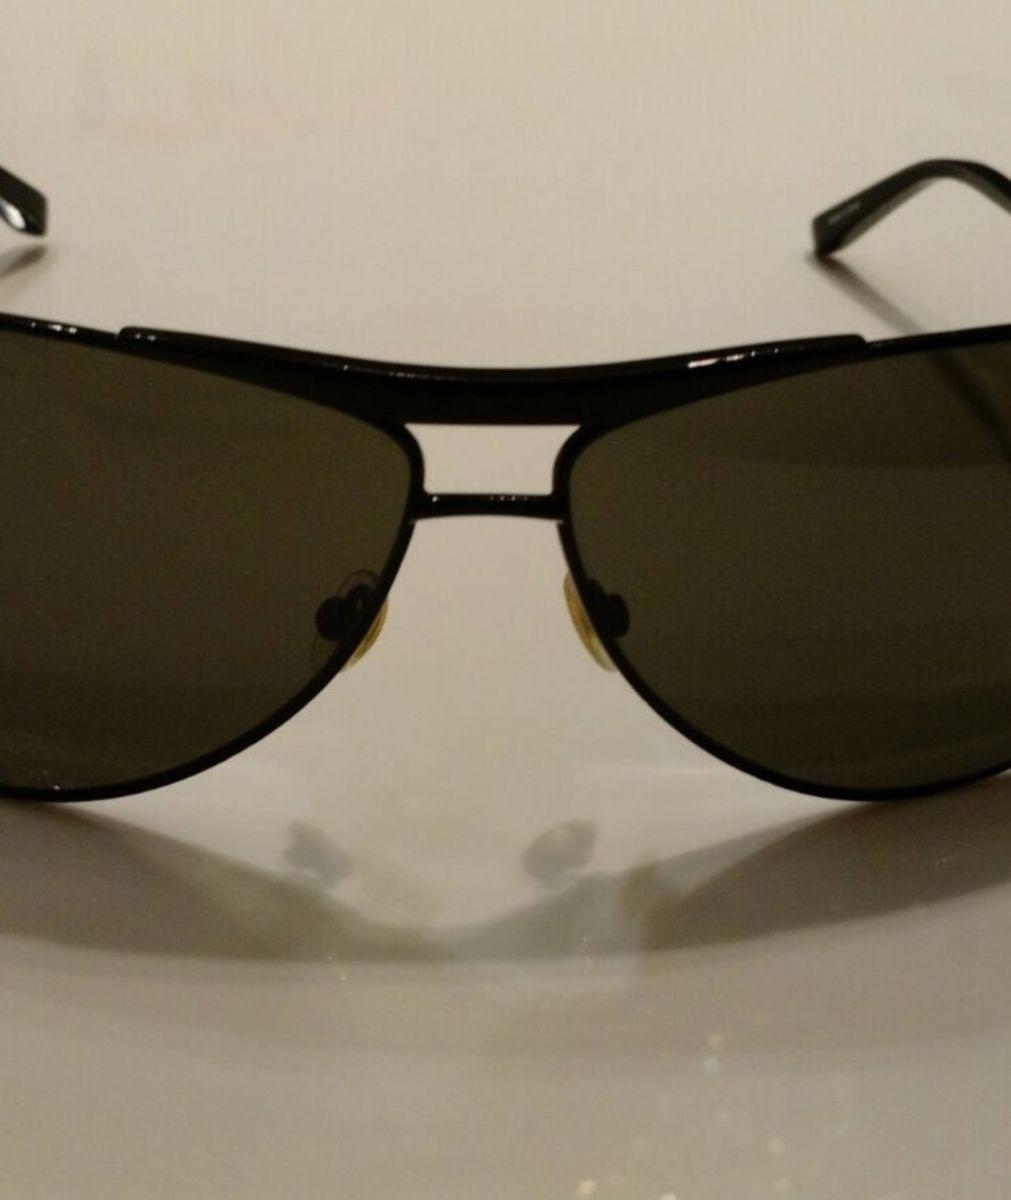 e6b5650d51b47 oculos quiksilver - óculos quiksilver.  Czm6ly9wag90b3muzw5qb2vplmnvbs5ici9wcm9kdwn0cy84mtq4mtkvmdq4ymzjzdmznjawntdlztdlzgm3zdhmymizmdkwm2iuanbn  ...